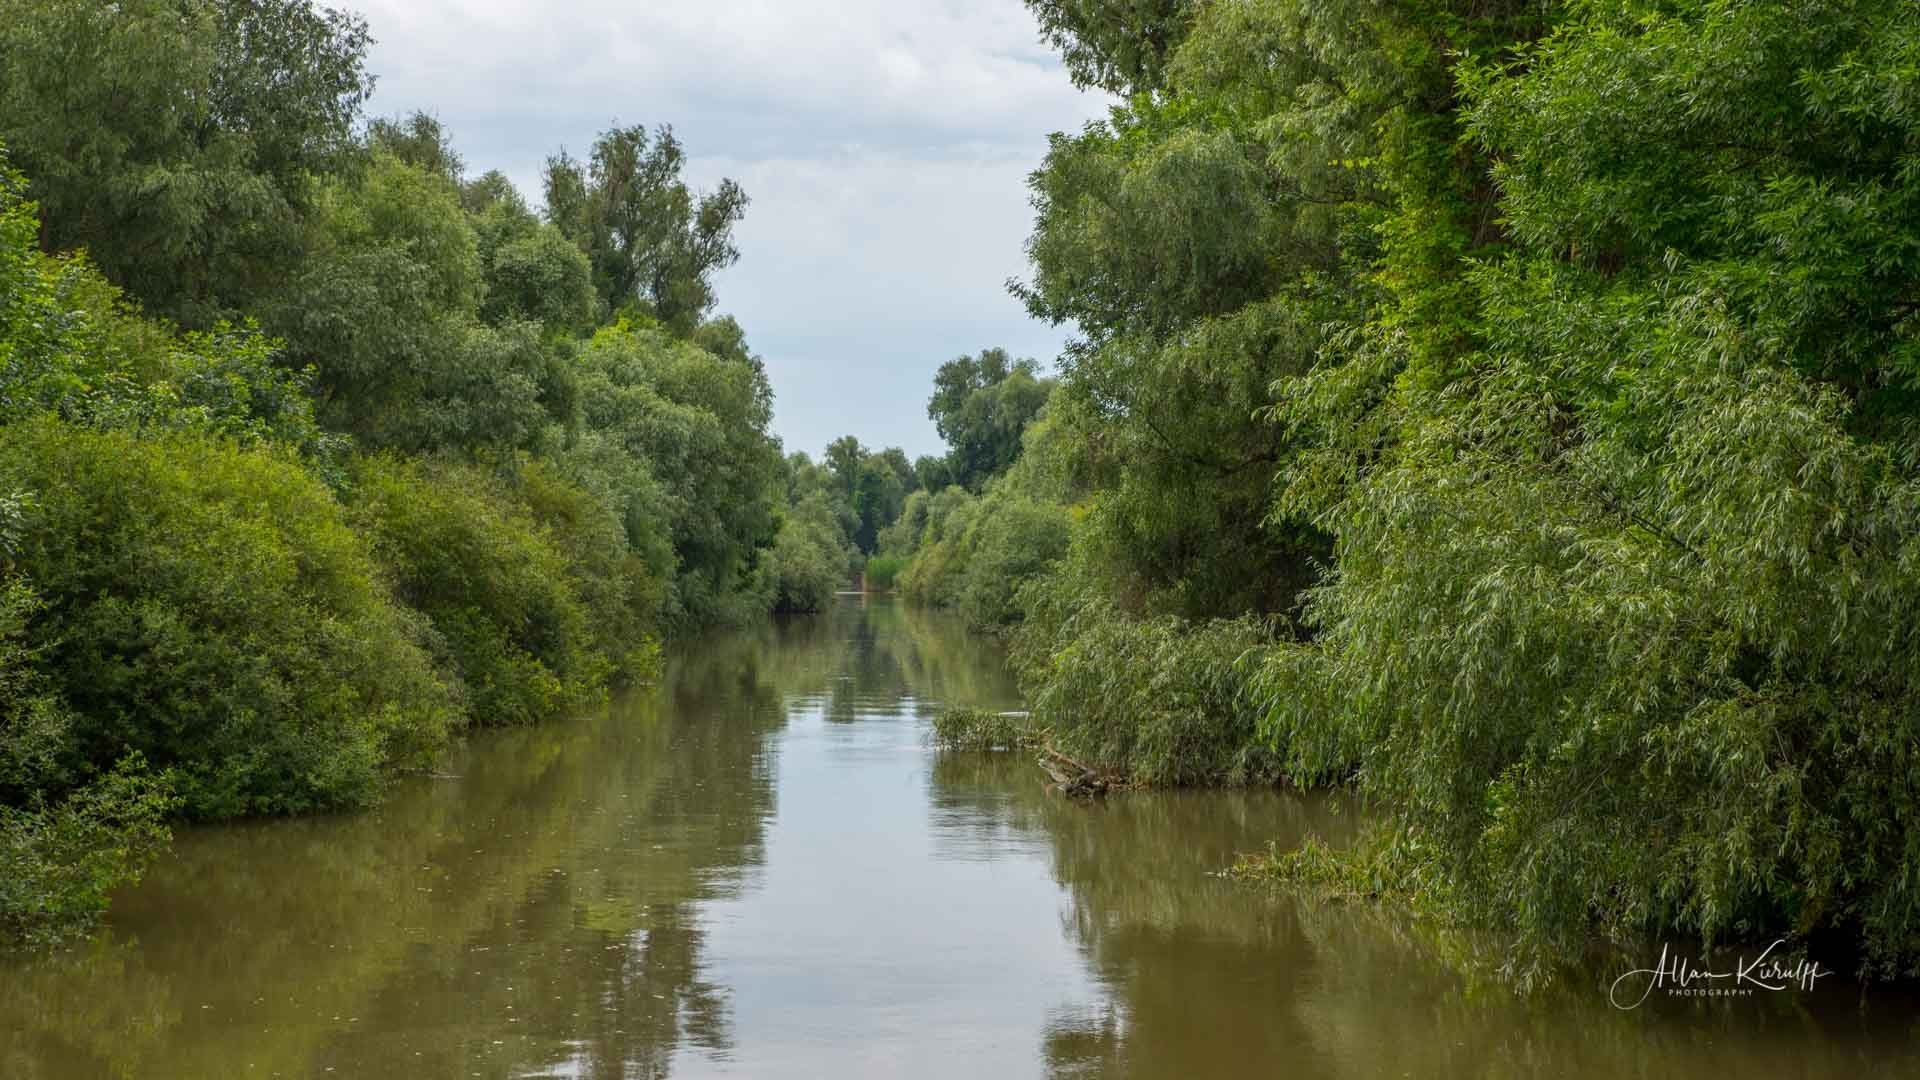 Donau Deltaet 44